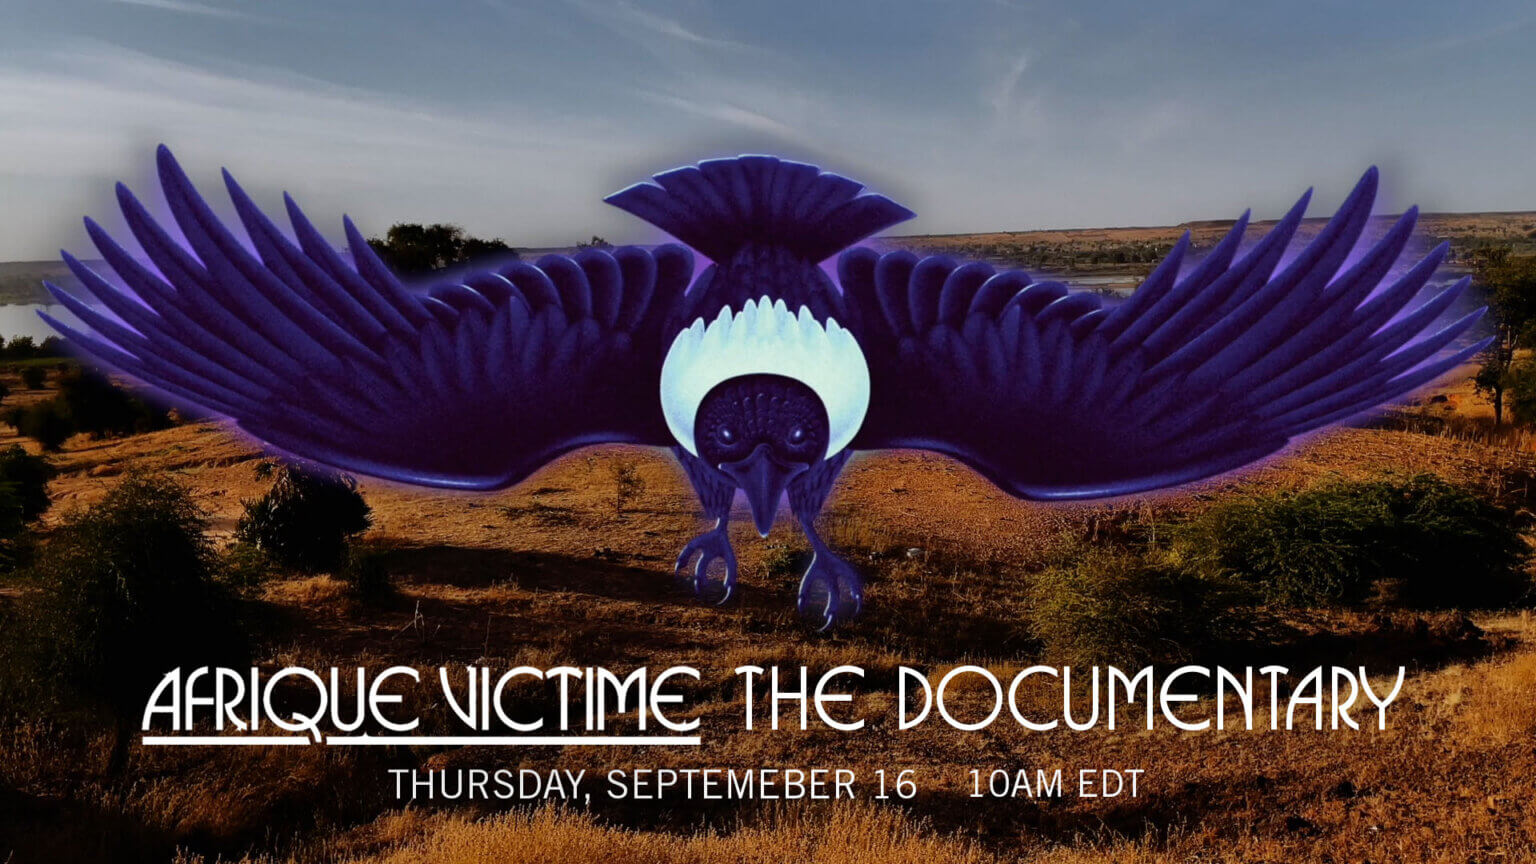 Mdou Moctar have released the film Victime Afrique